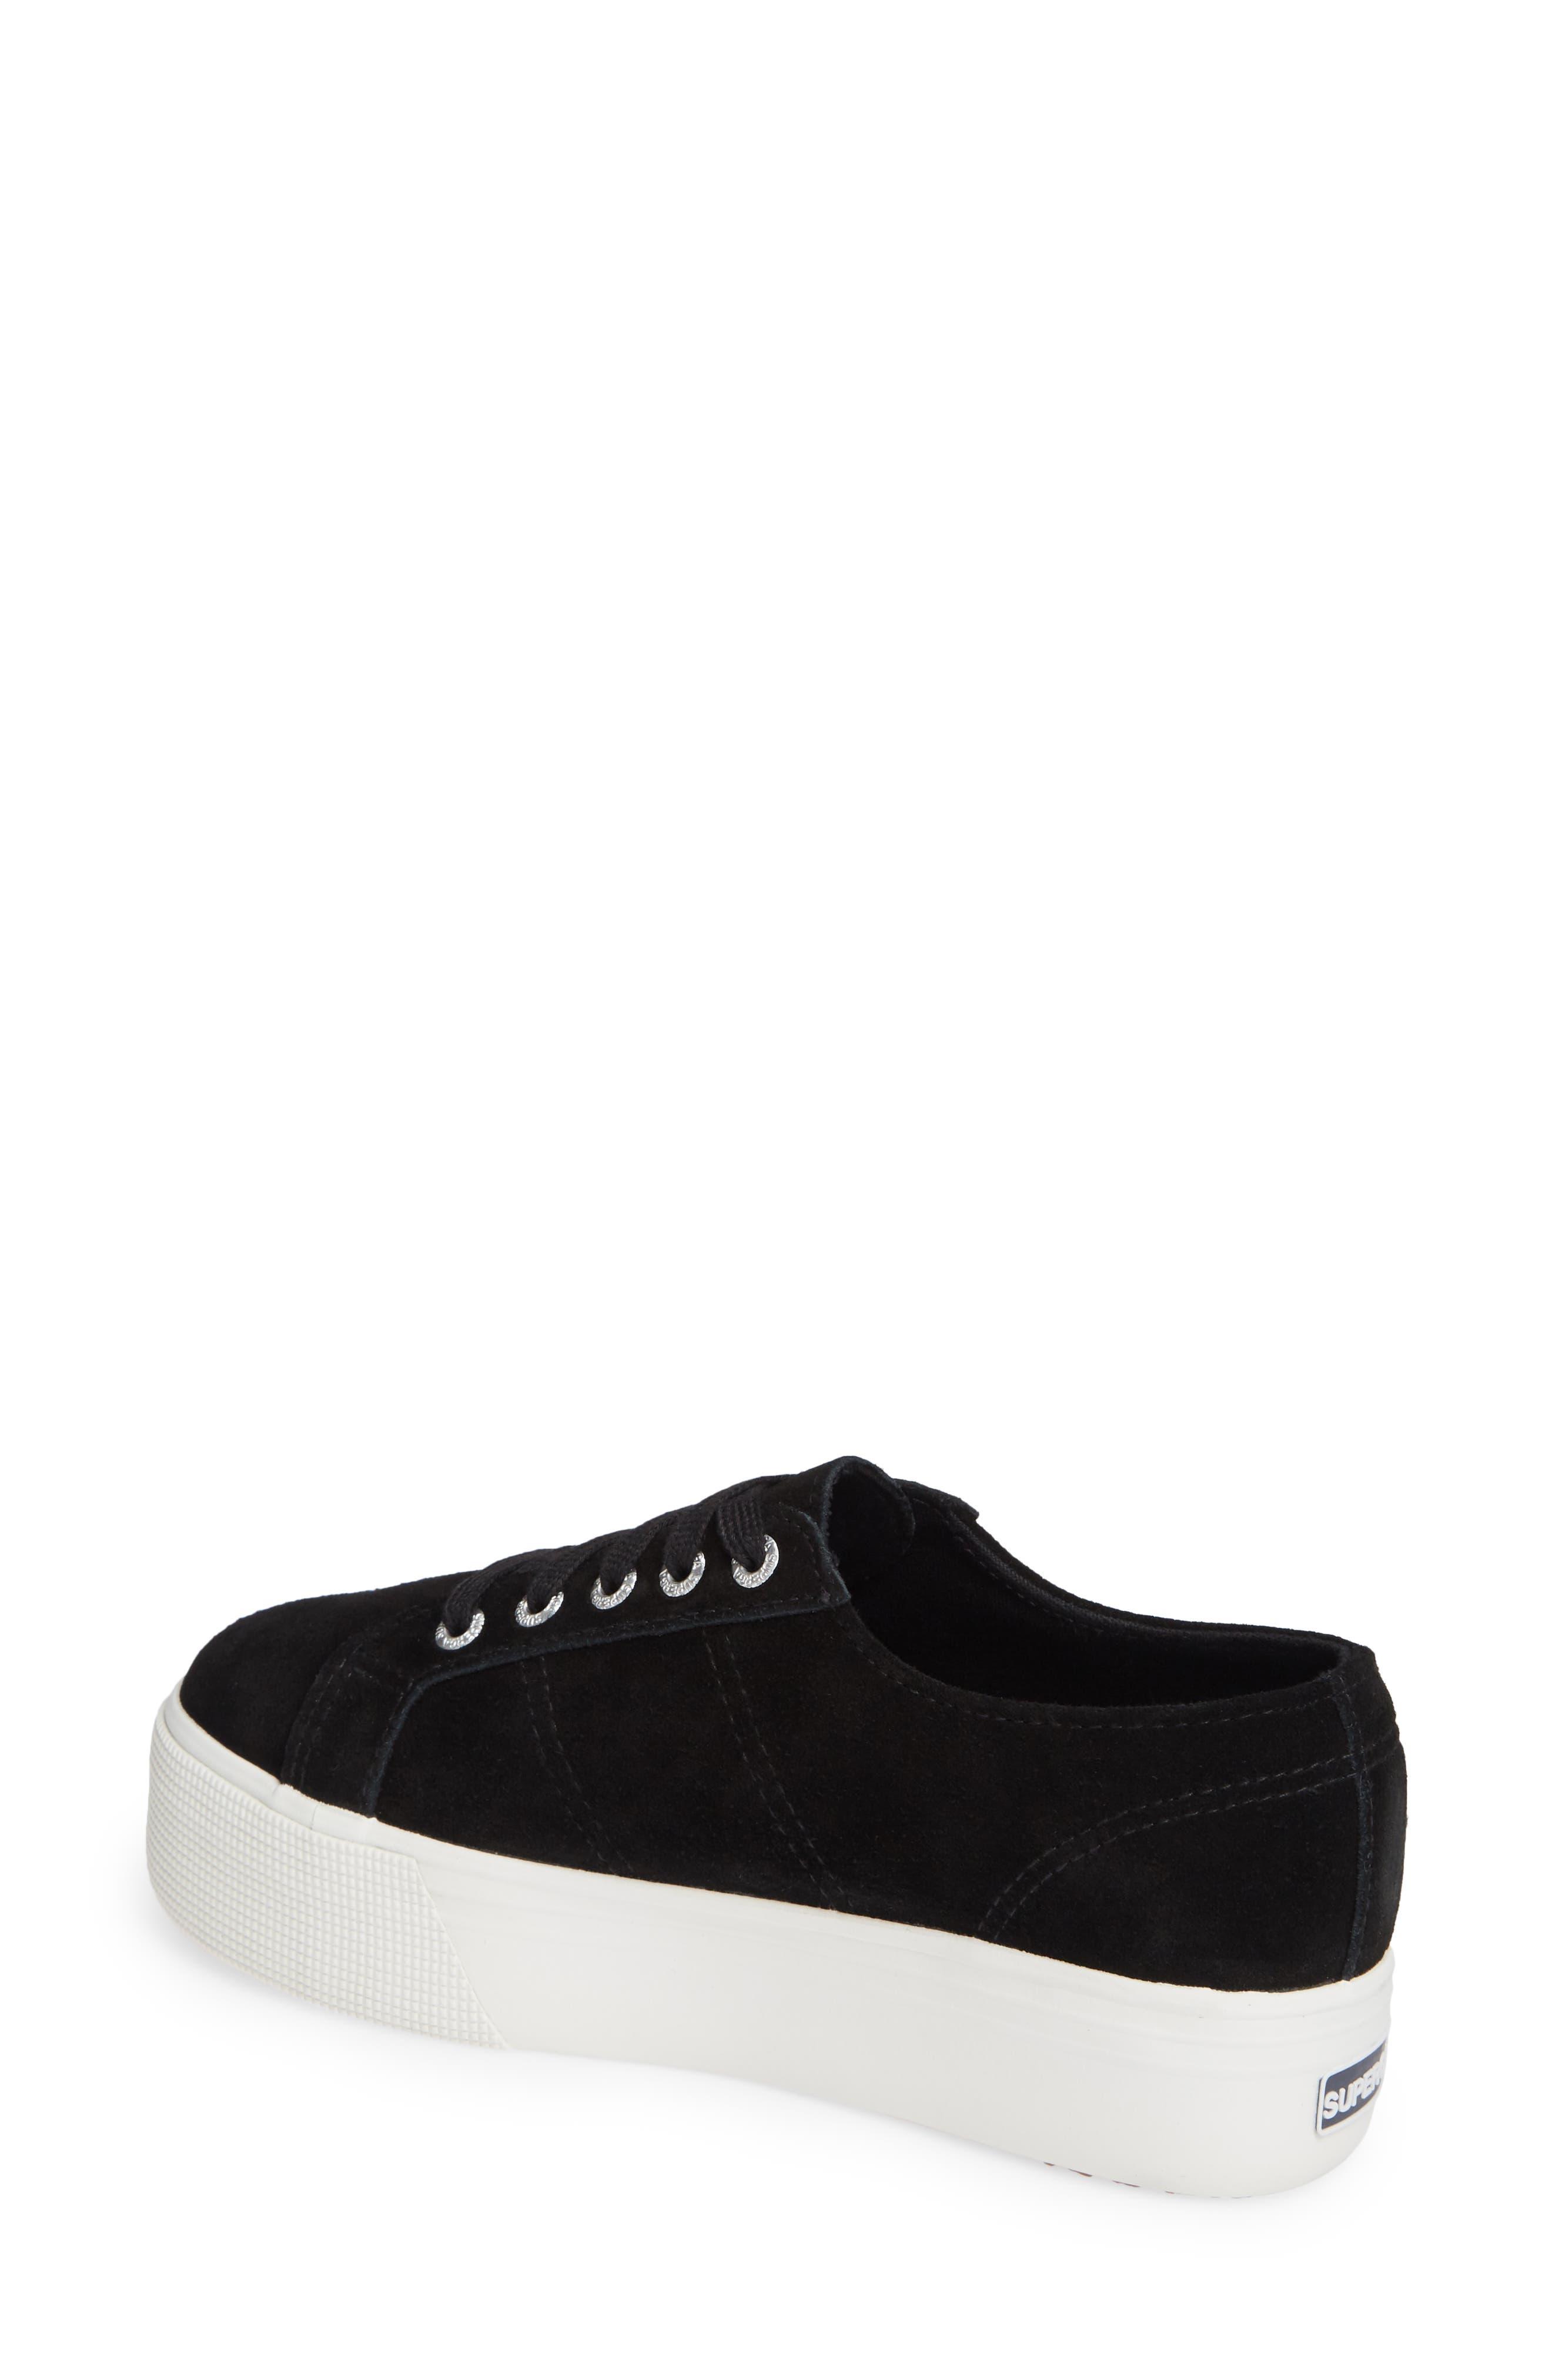 2790 Platform Sneaker,                             Alternate thumbnail 2, color,                             006